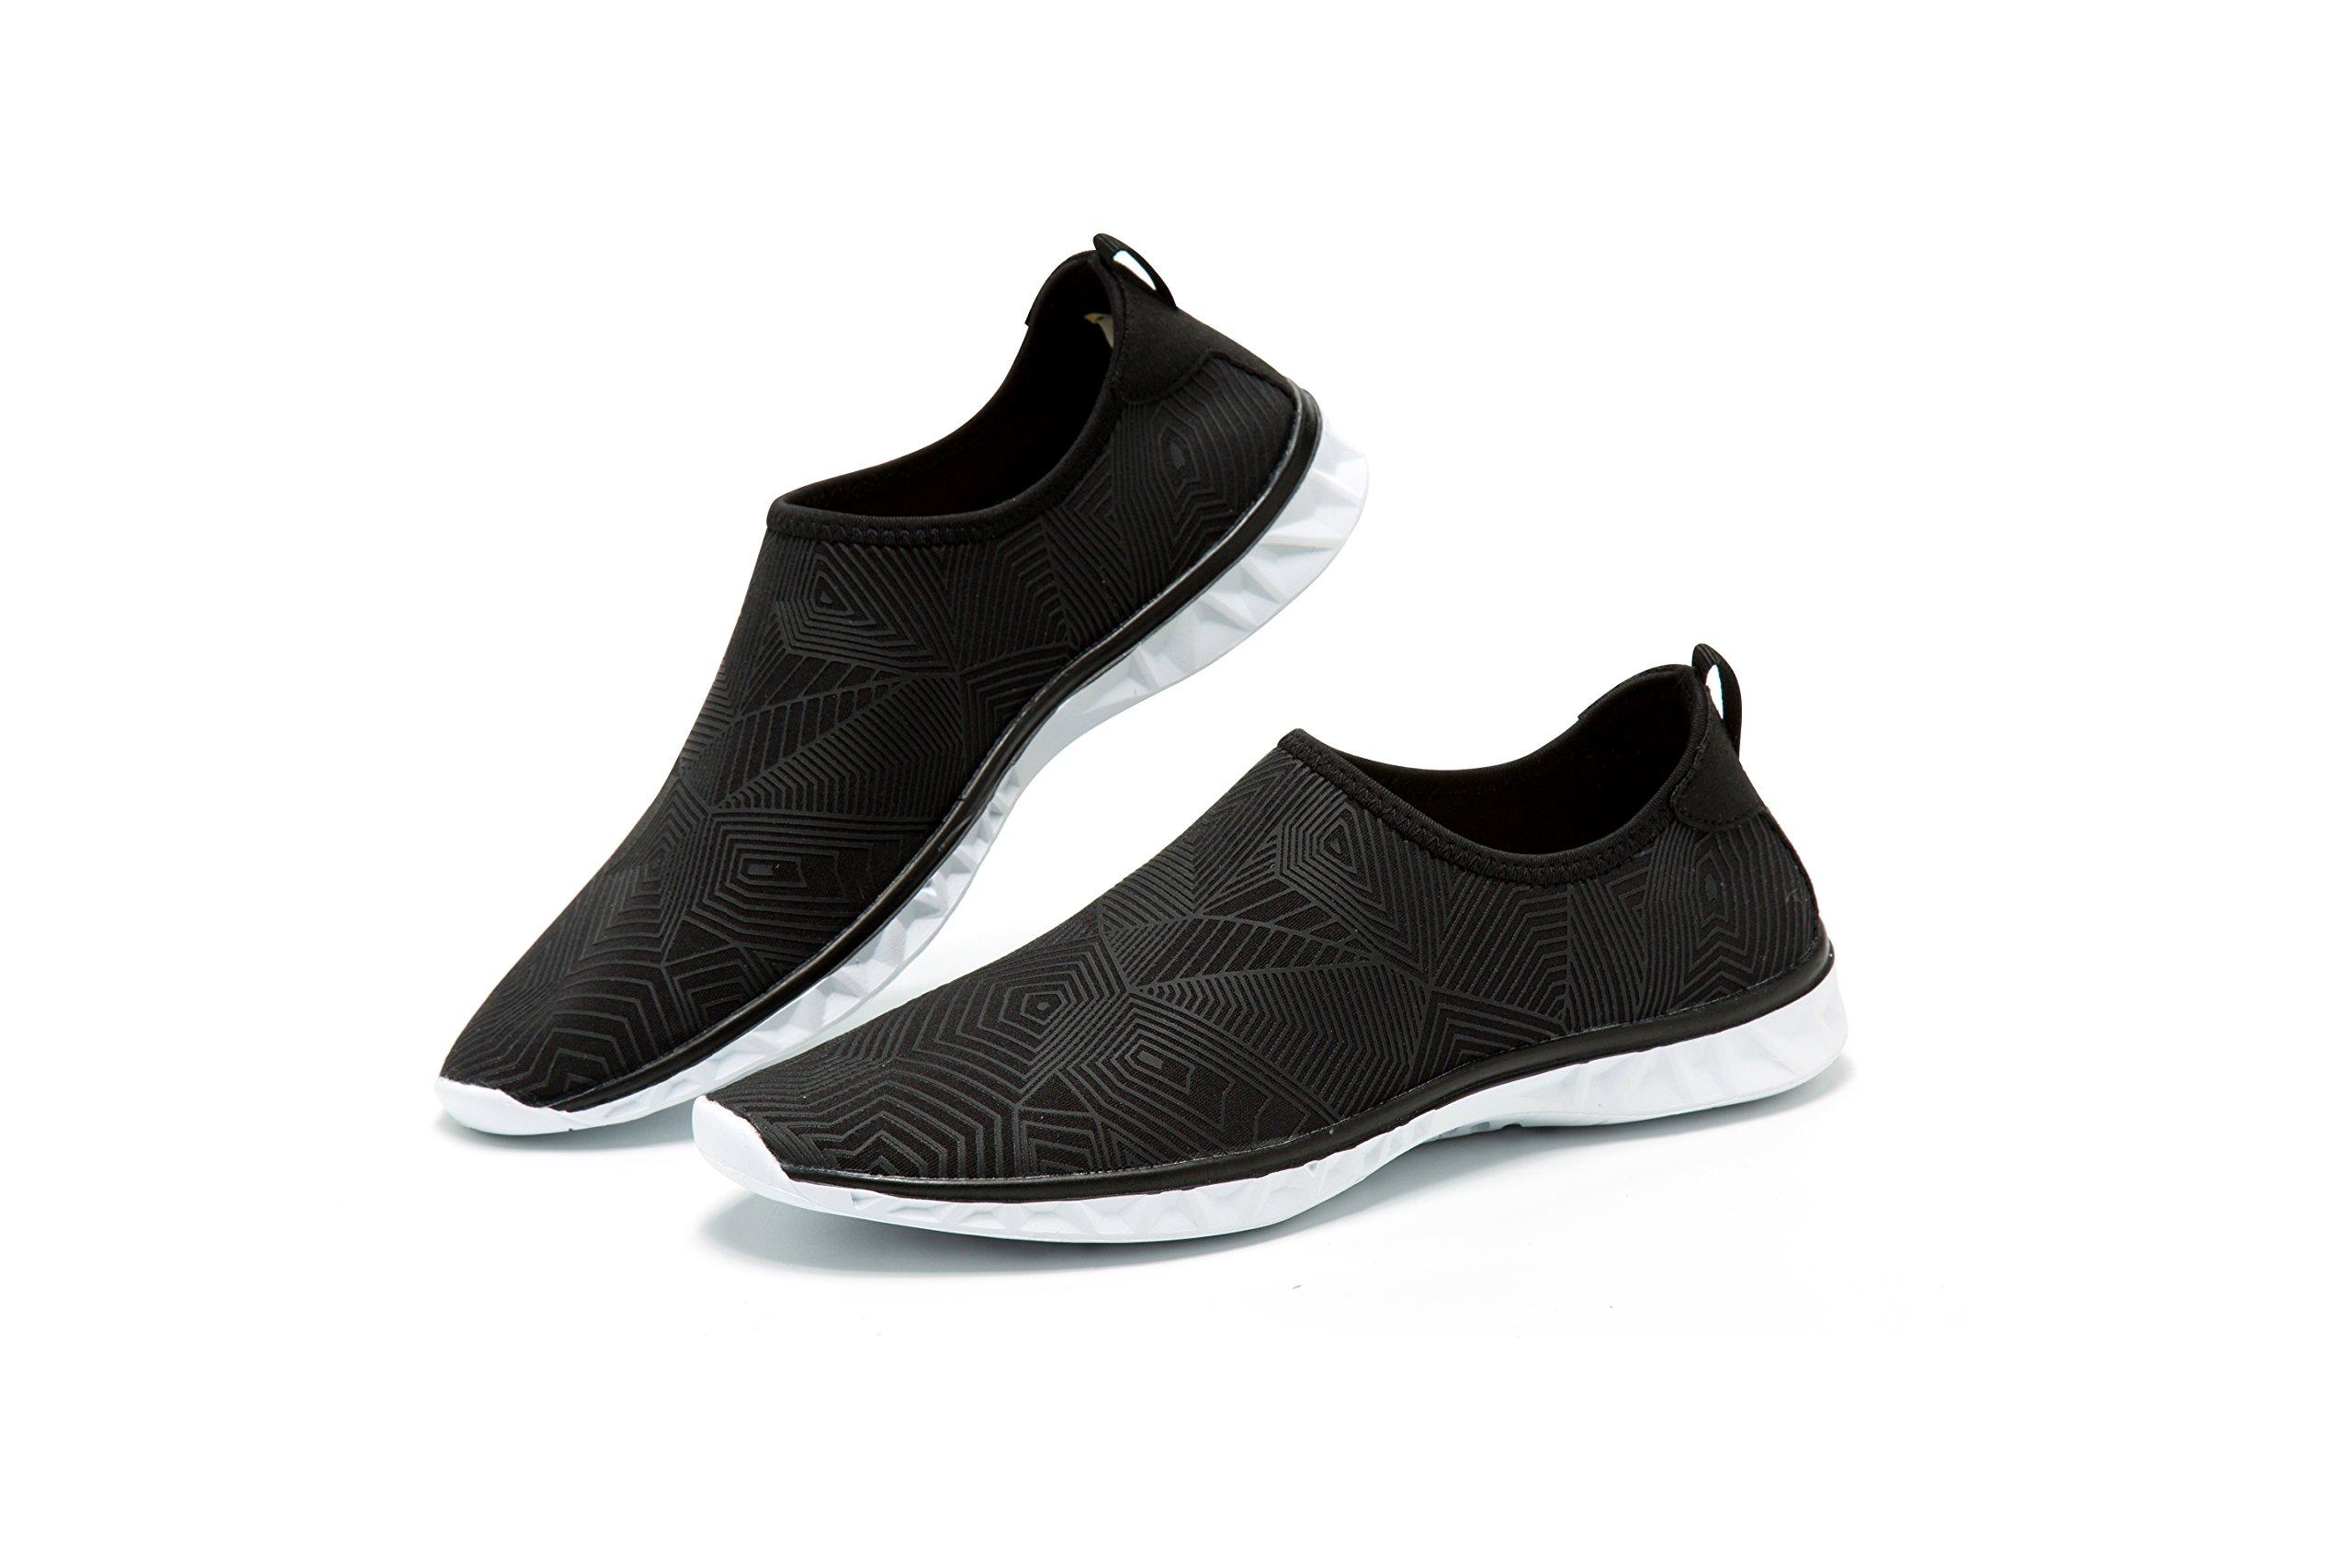 AVADAR Water Shoes, Men Women Barefoot Quick Dry Aqua Shoes,Black2,10US Women/8.5US Men-10.5Inch foot